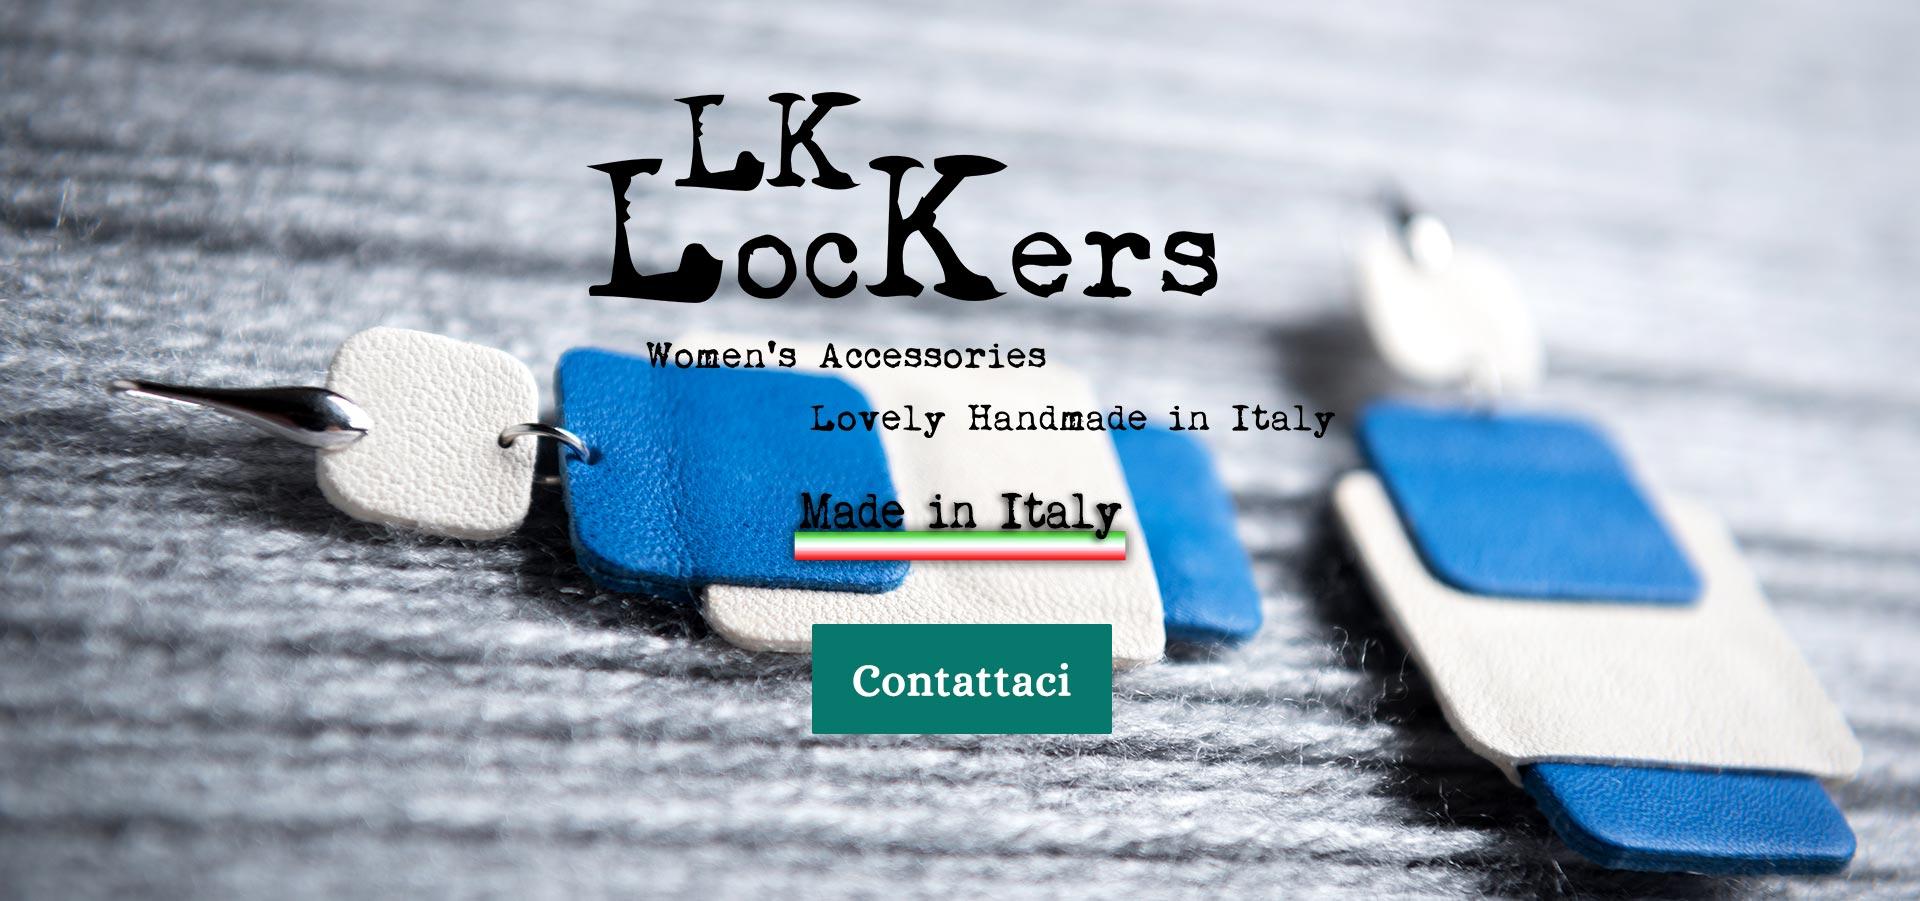 lk-lockers-gioielli-in-pelle-home-slider-001